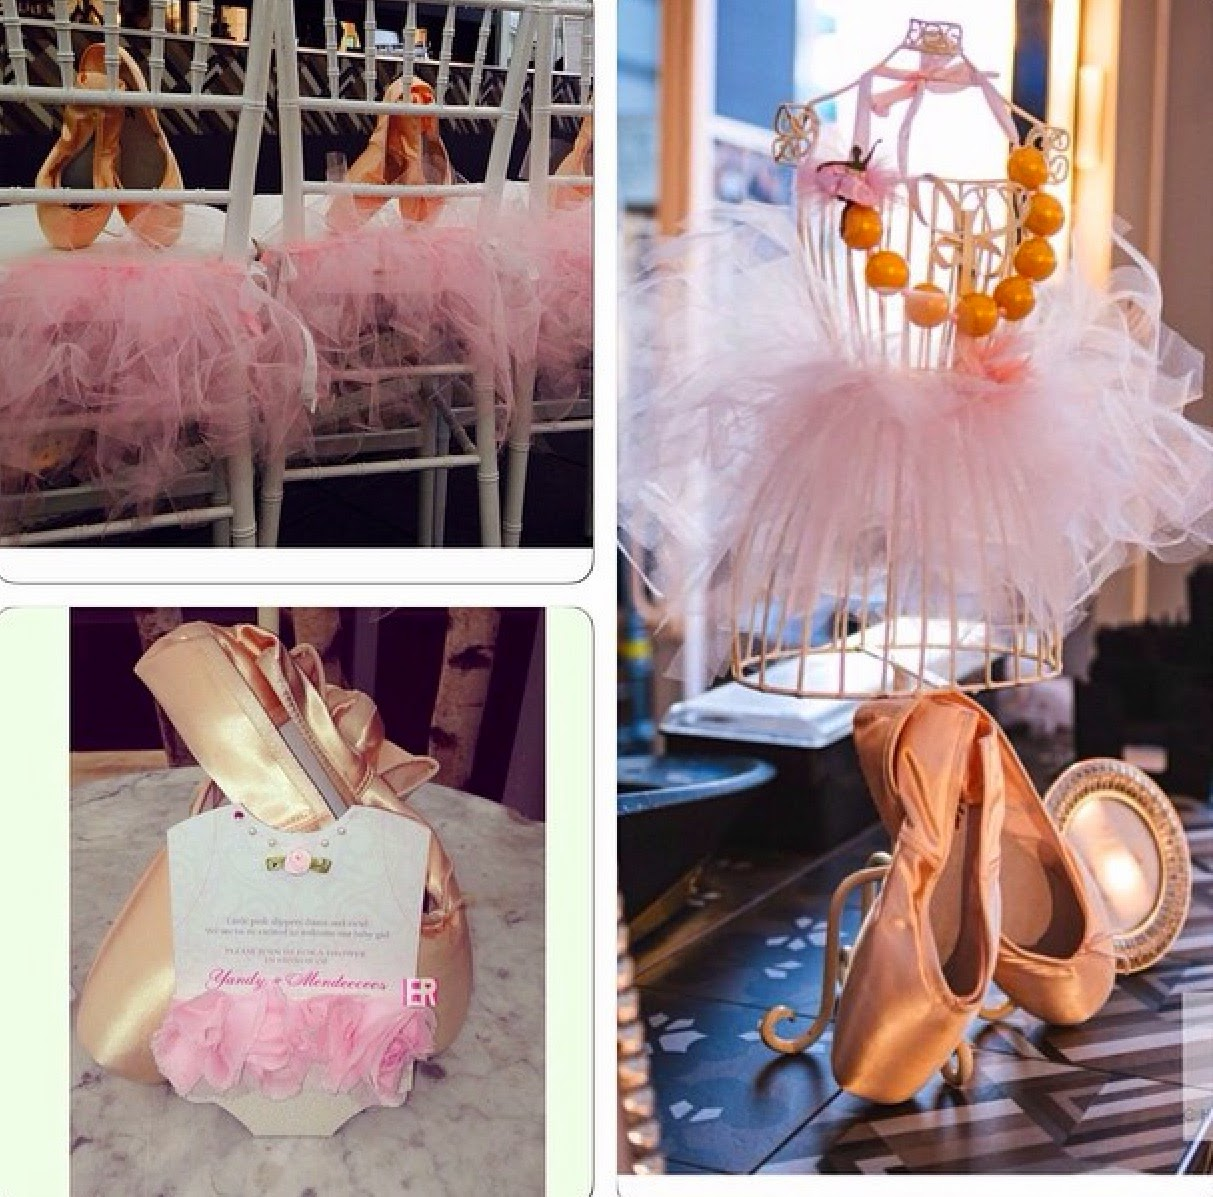 Yandy Smith Ballerina Themed Baby Shower